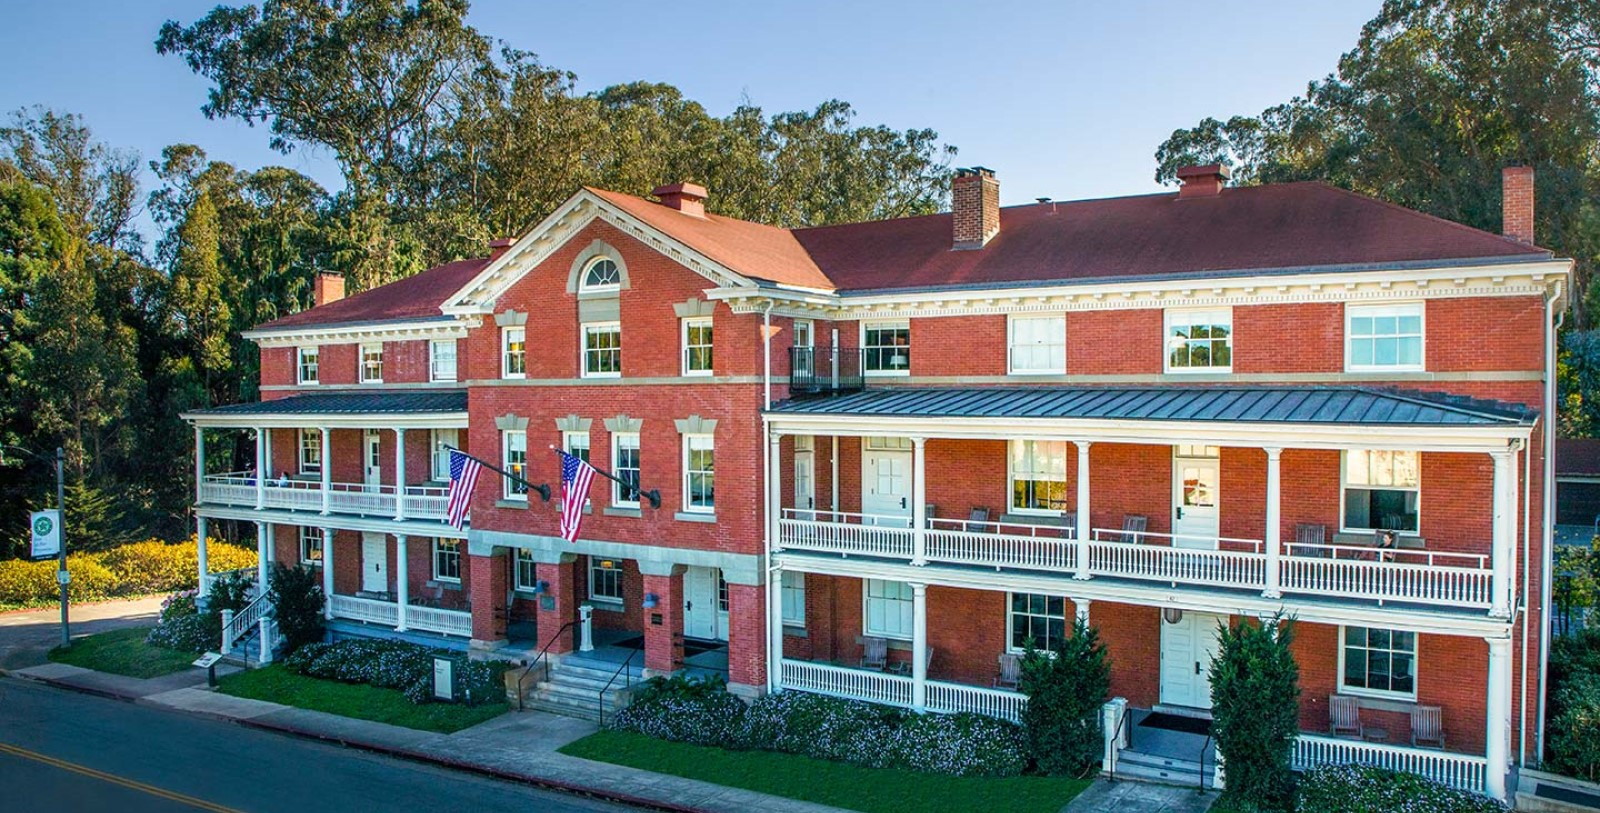 Image of Hotel Exterior, Inn at the Presidio in San Francisco, California, 1903, Member of Historic Hotels of America